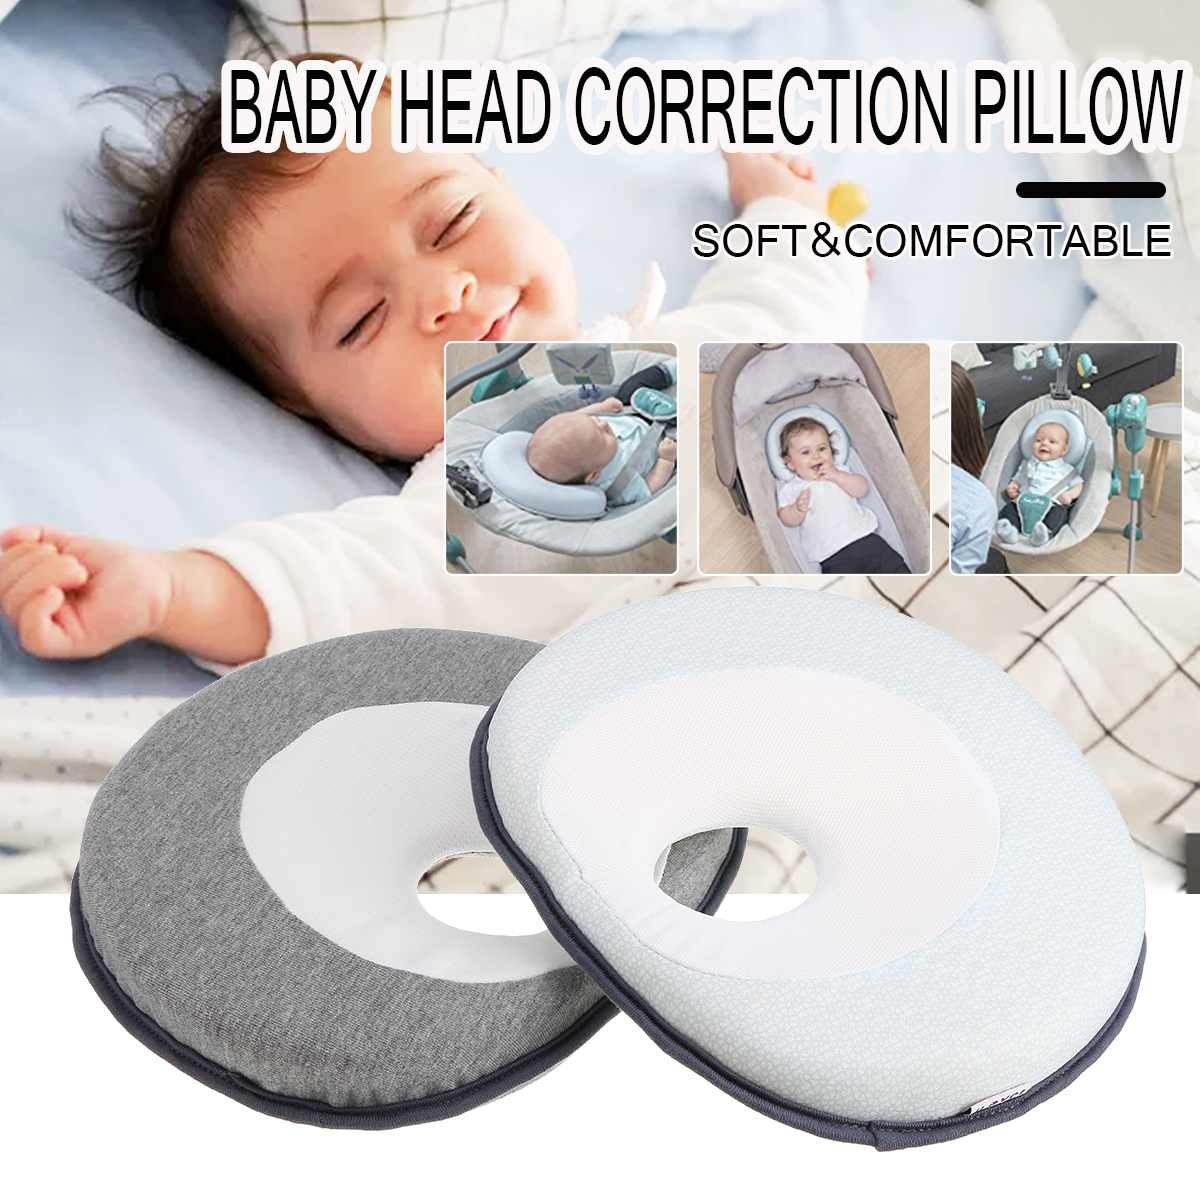 Baby Pillow Anti Flat Head Baby Pillow 0-1 Year Old Newborn Toddler Sleep Positioner Cushion Head Correction Corrective Head